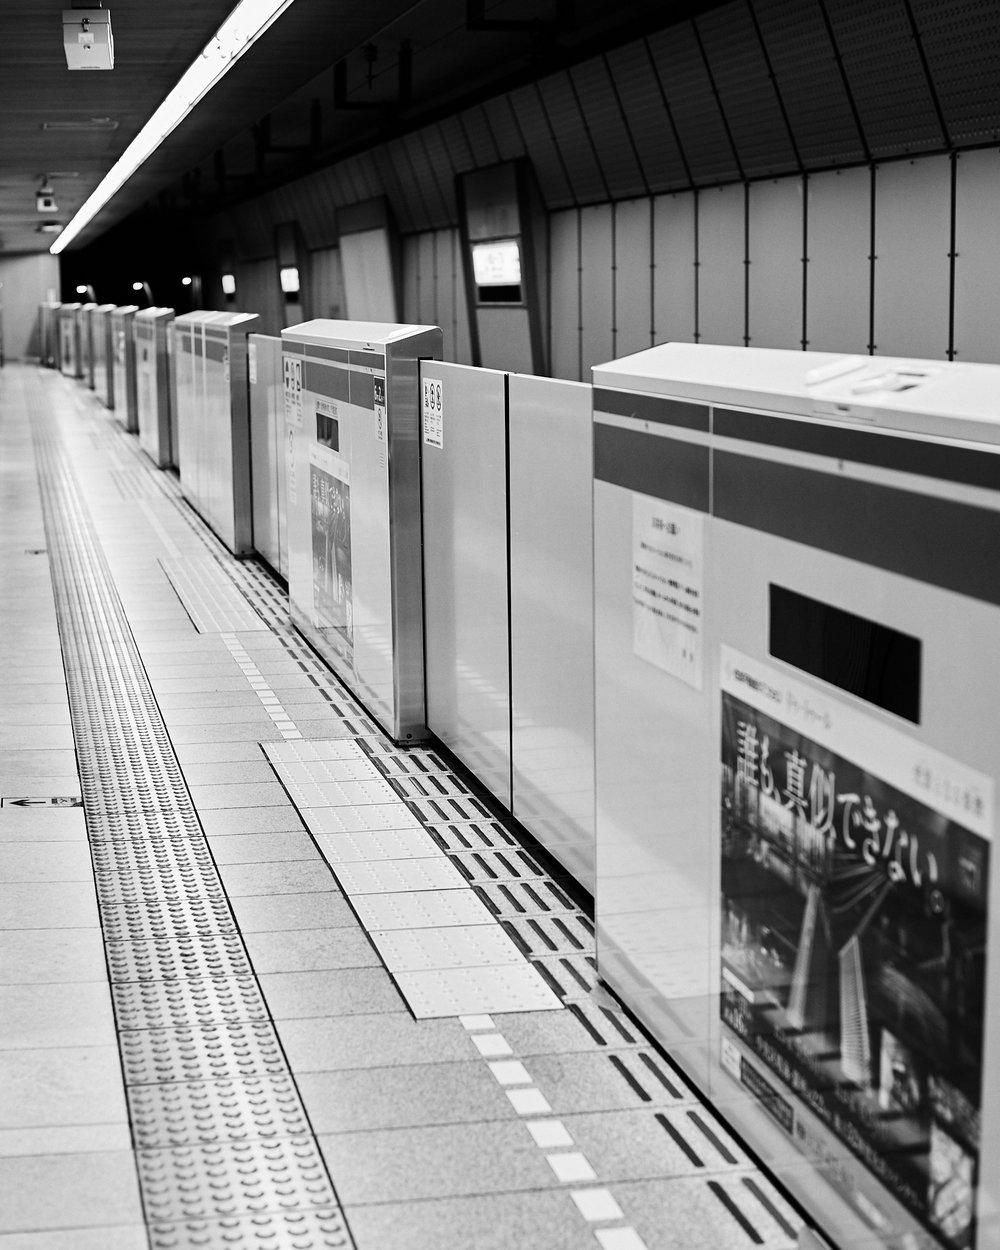 SnapPilots_17-07-07_Tokyo2017_bnw_99.jpg